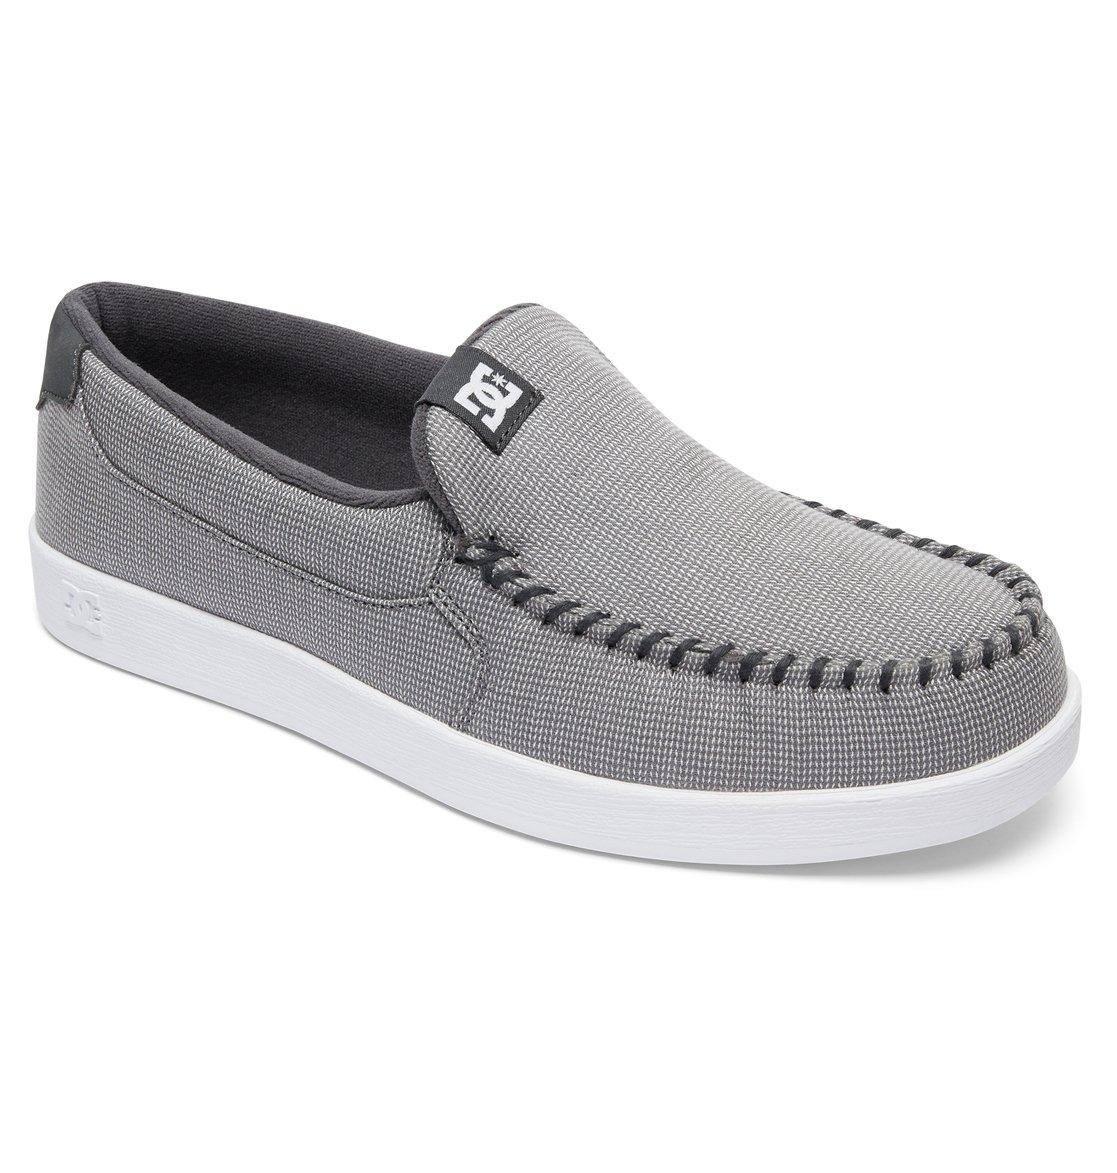 White Dc Villain Shoes